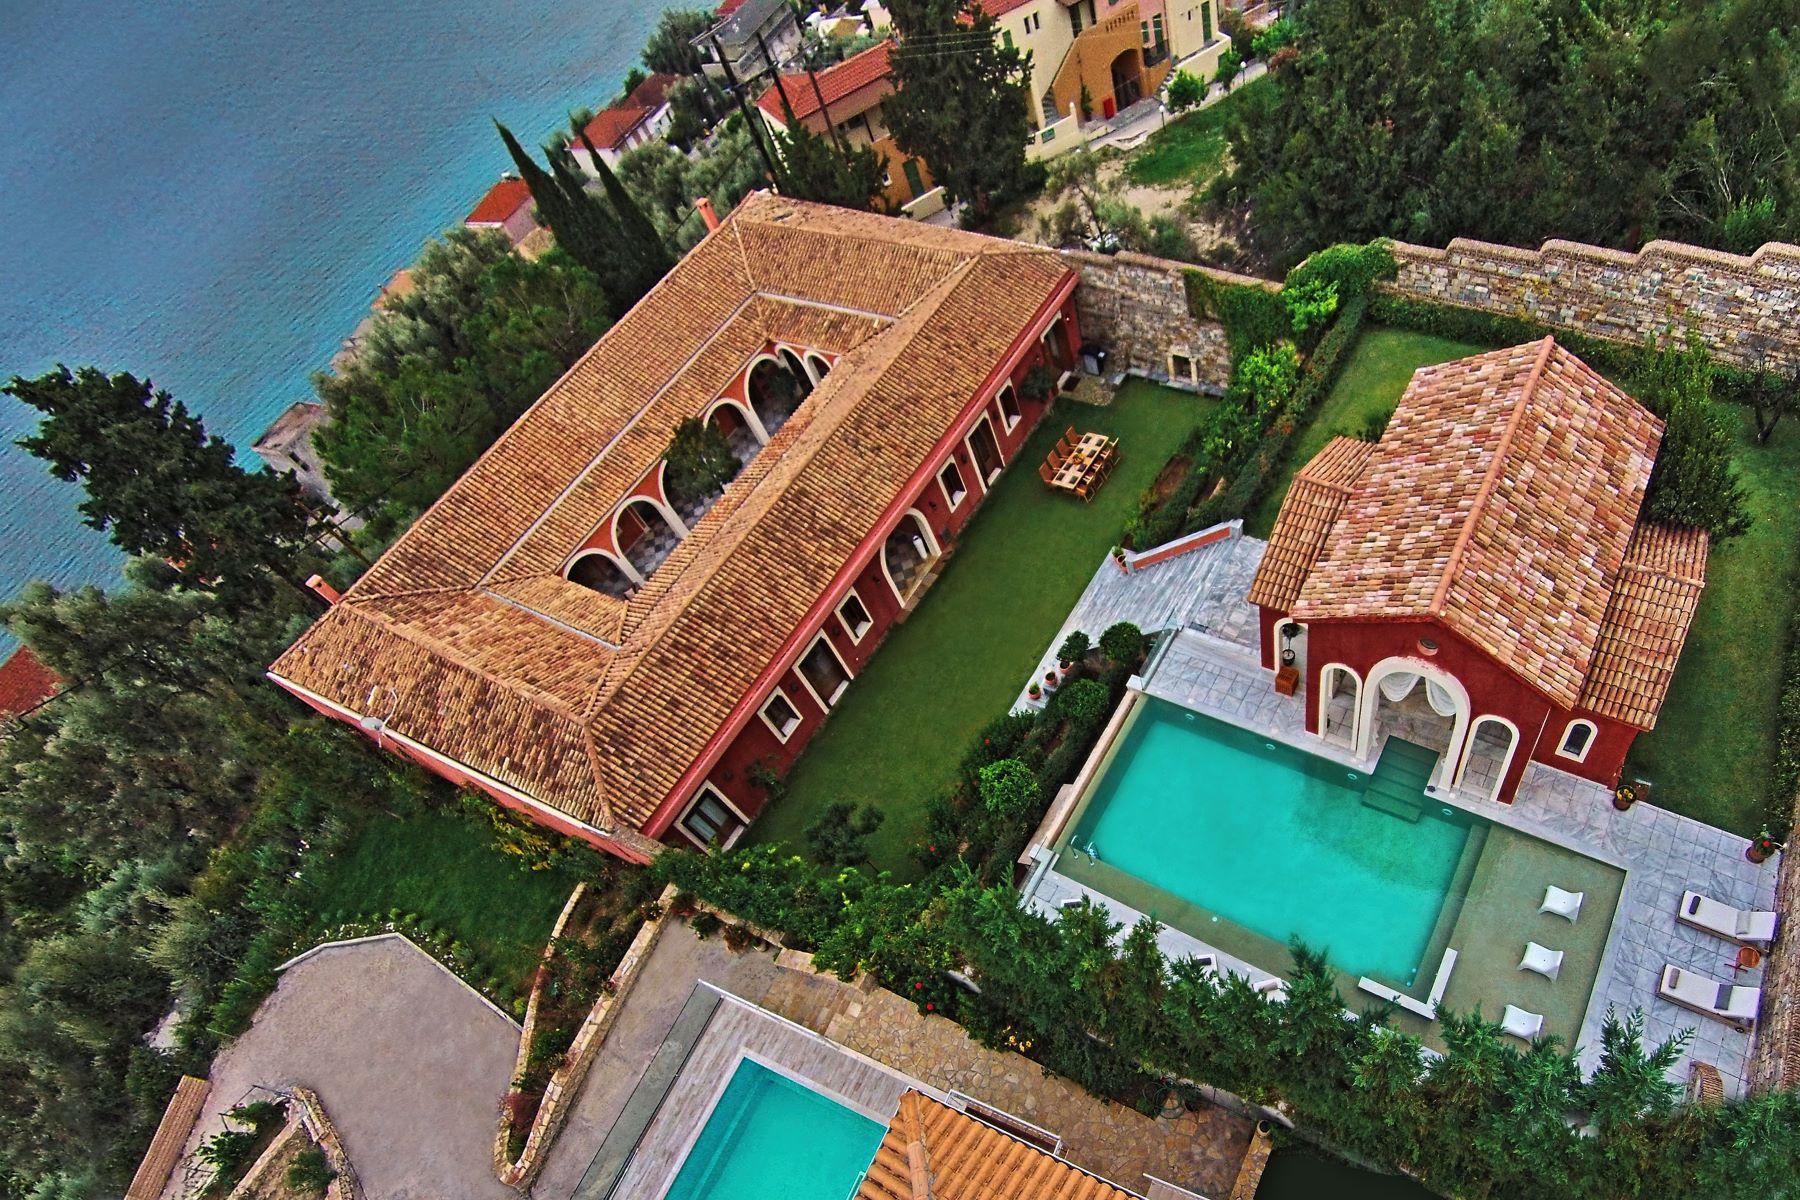 Single Family Home for Sale at The Venetian Perigiali The Venetian Lefkada, Lefkada, 31100 Greece